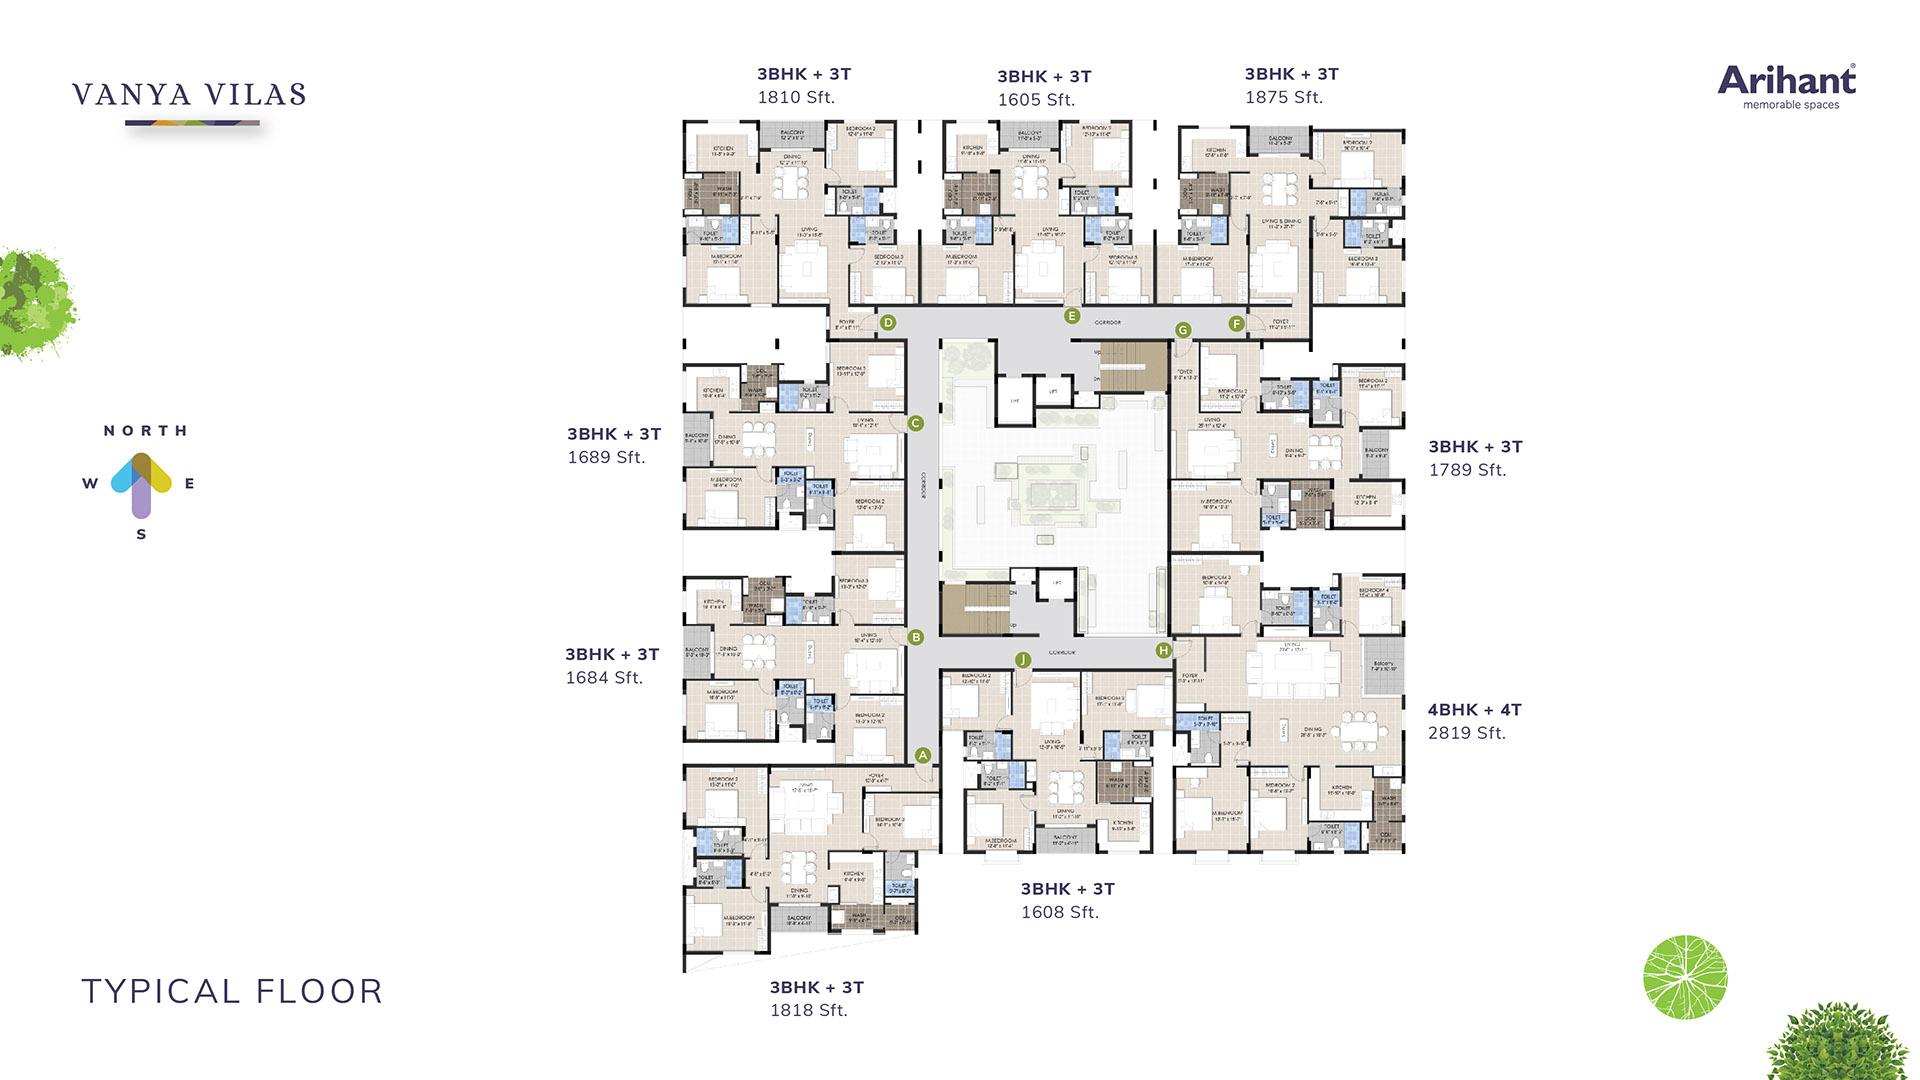 3 Arihant Vanya Vilas Typical Floor